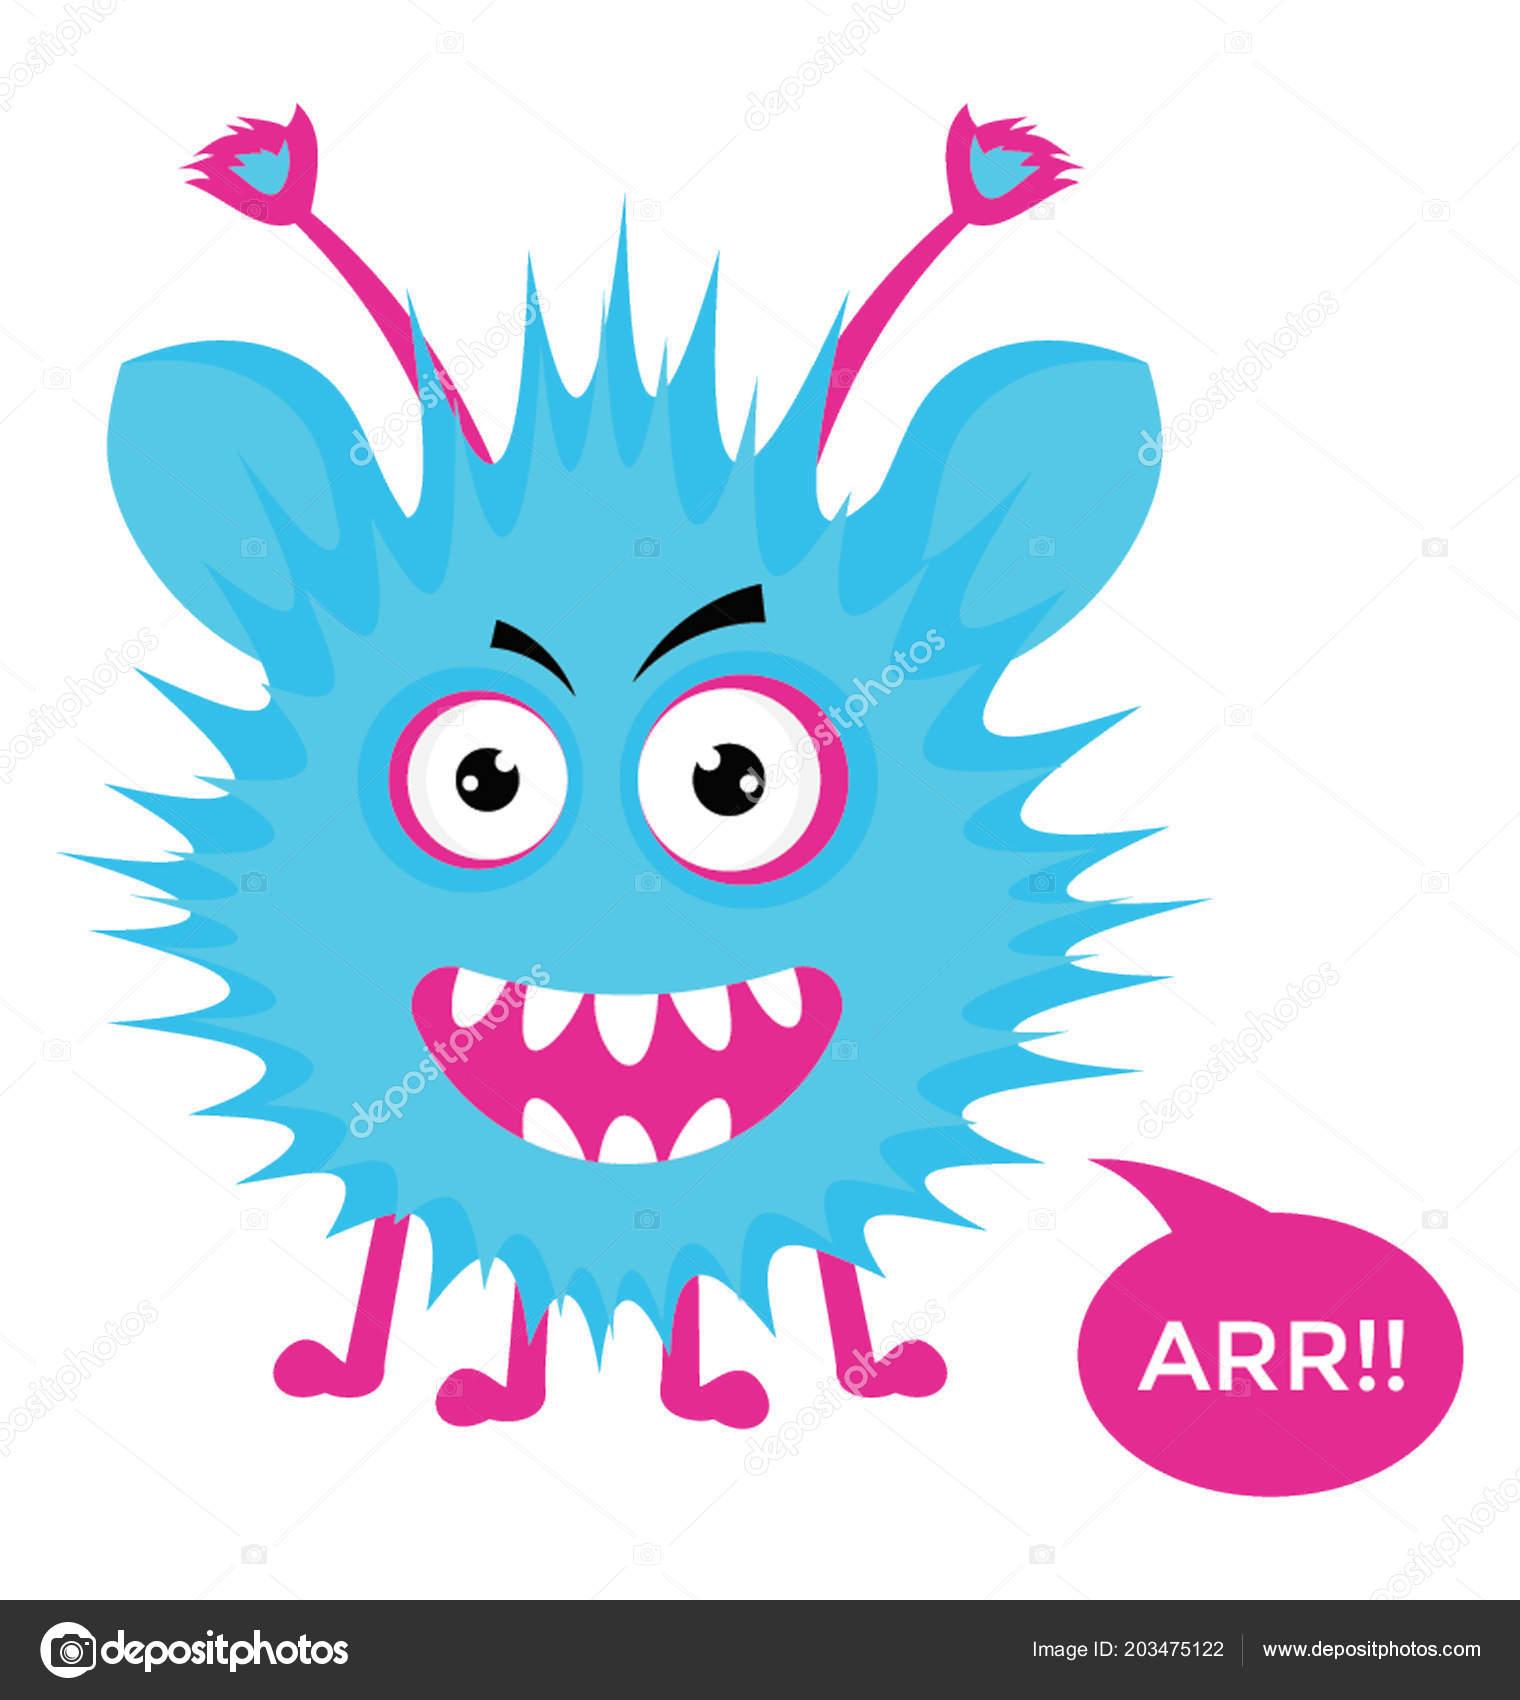 Cute Cartoon Fluffy Monster Growling Arr Message Bubble Flat Vector Stock Vector C Vectorsmarket 203475122